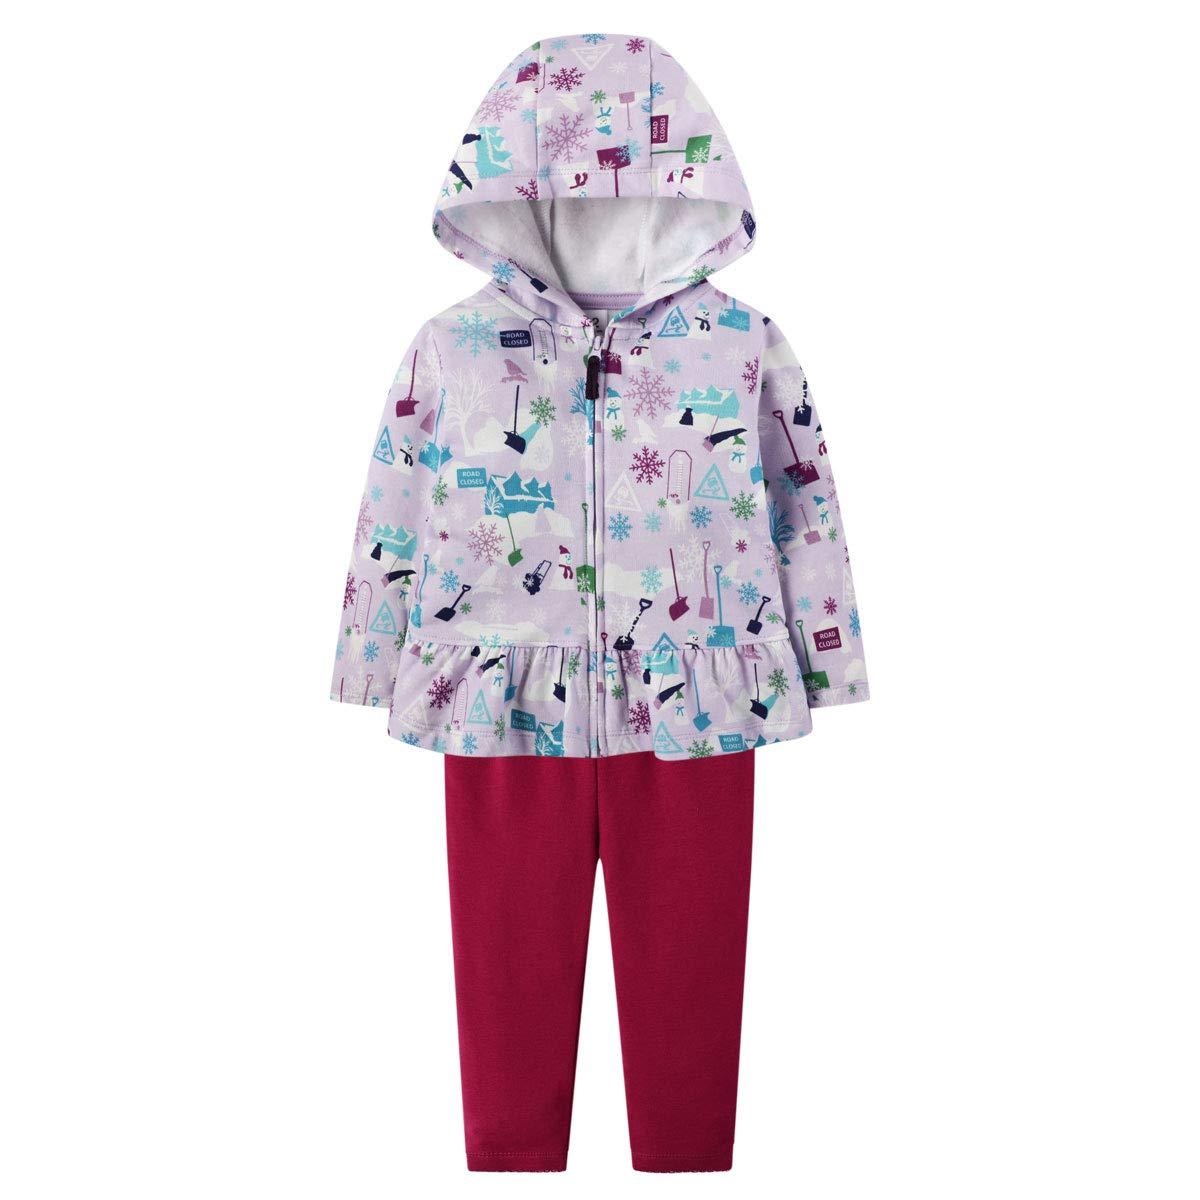 Baby Girl Clothes Set Fleece Jacket Hoodie Sweatshirt Cotton Pants Winter Outfit